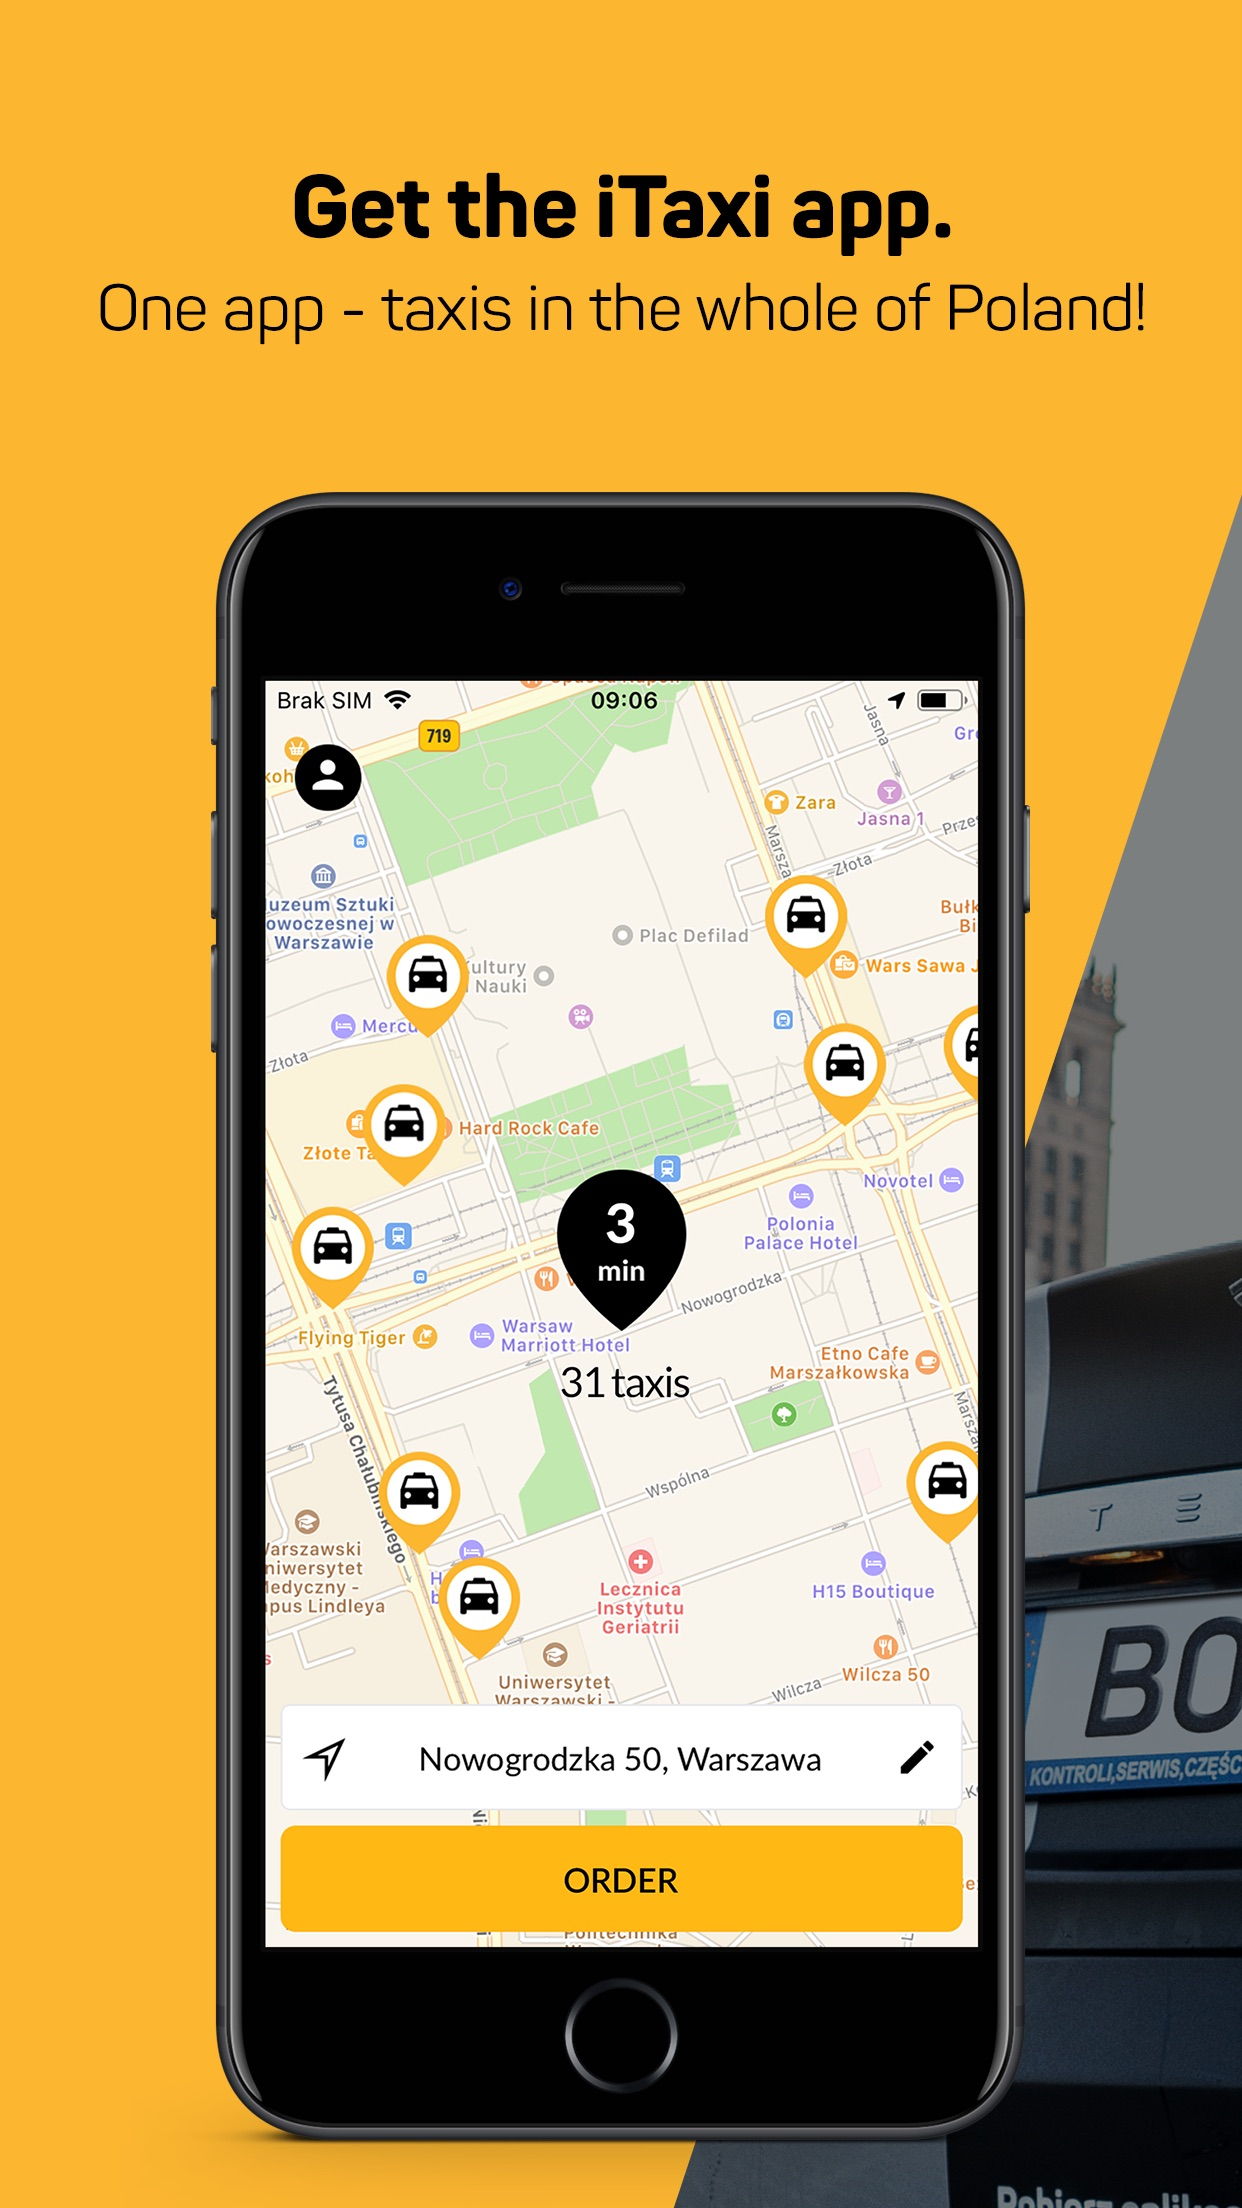 iTaxi - The Taxi App Screenshot